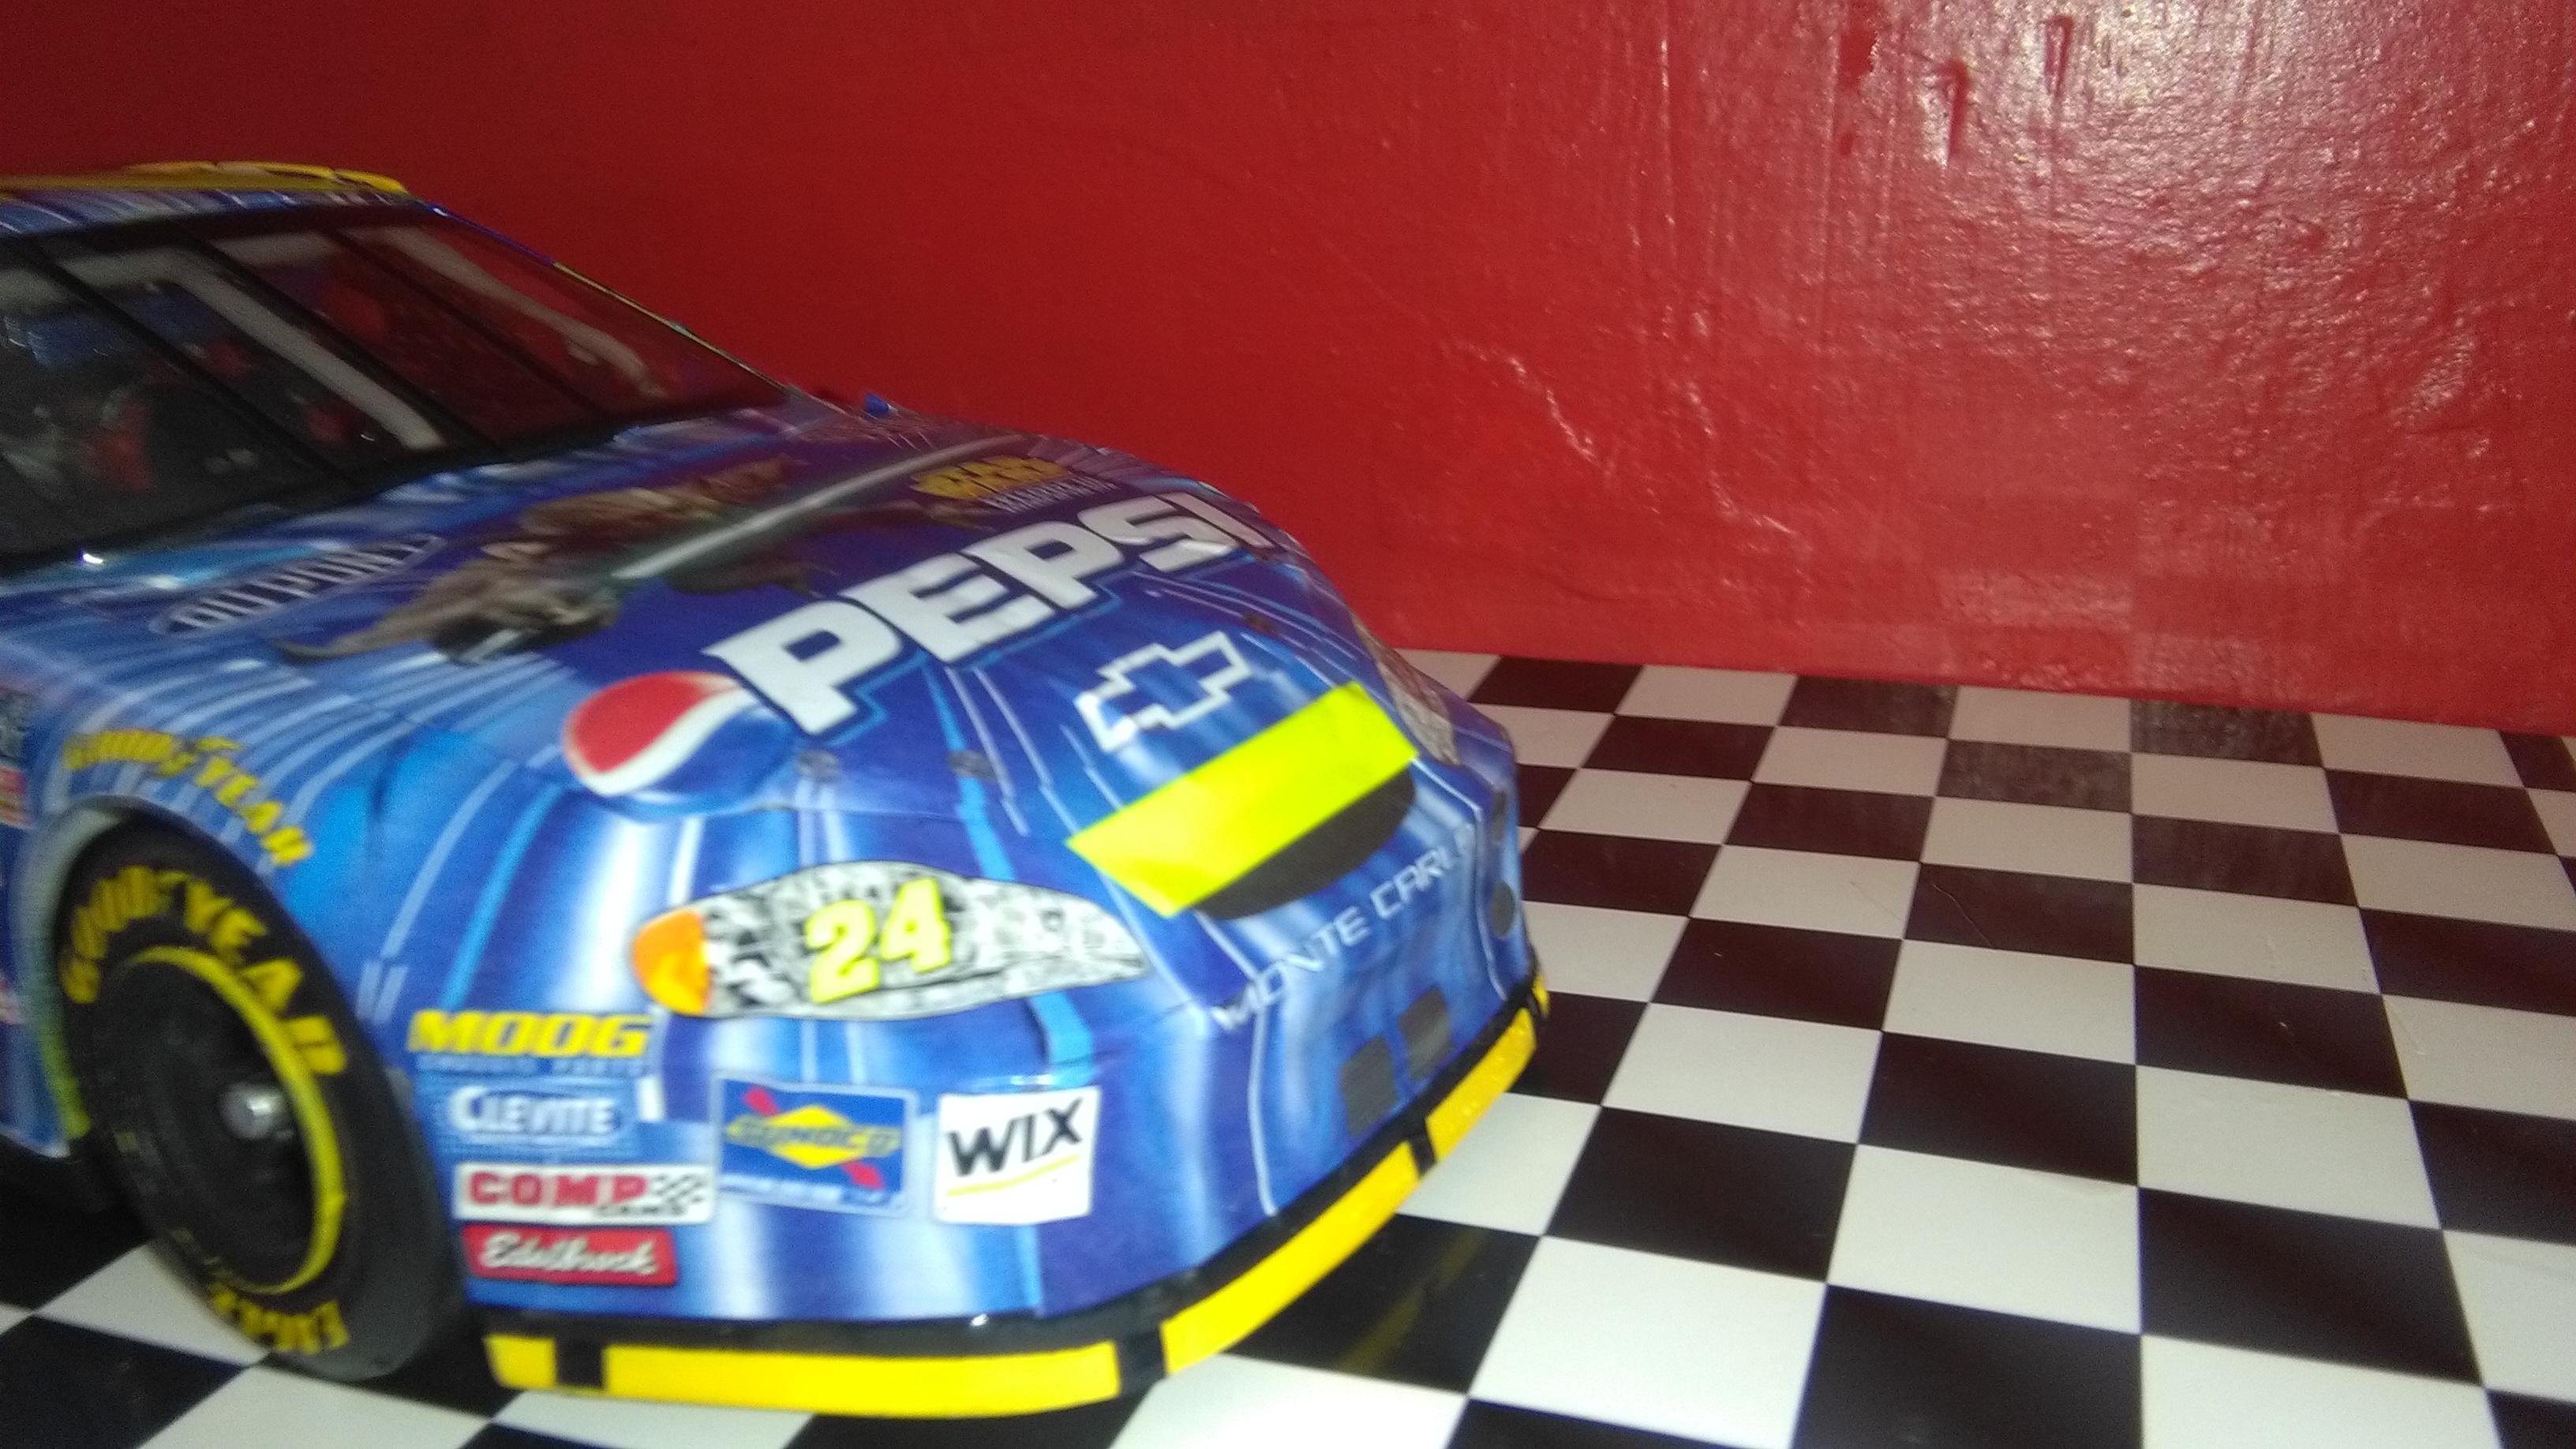 Chevy Monte-Carlo 2005 #24 Jeff Gordon Pepsi/Star Wars  500239IMG20170430170043